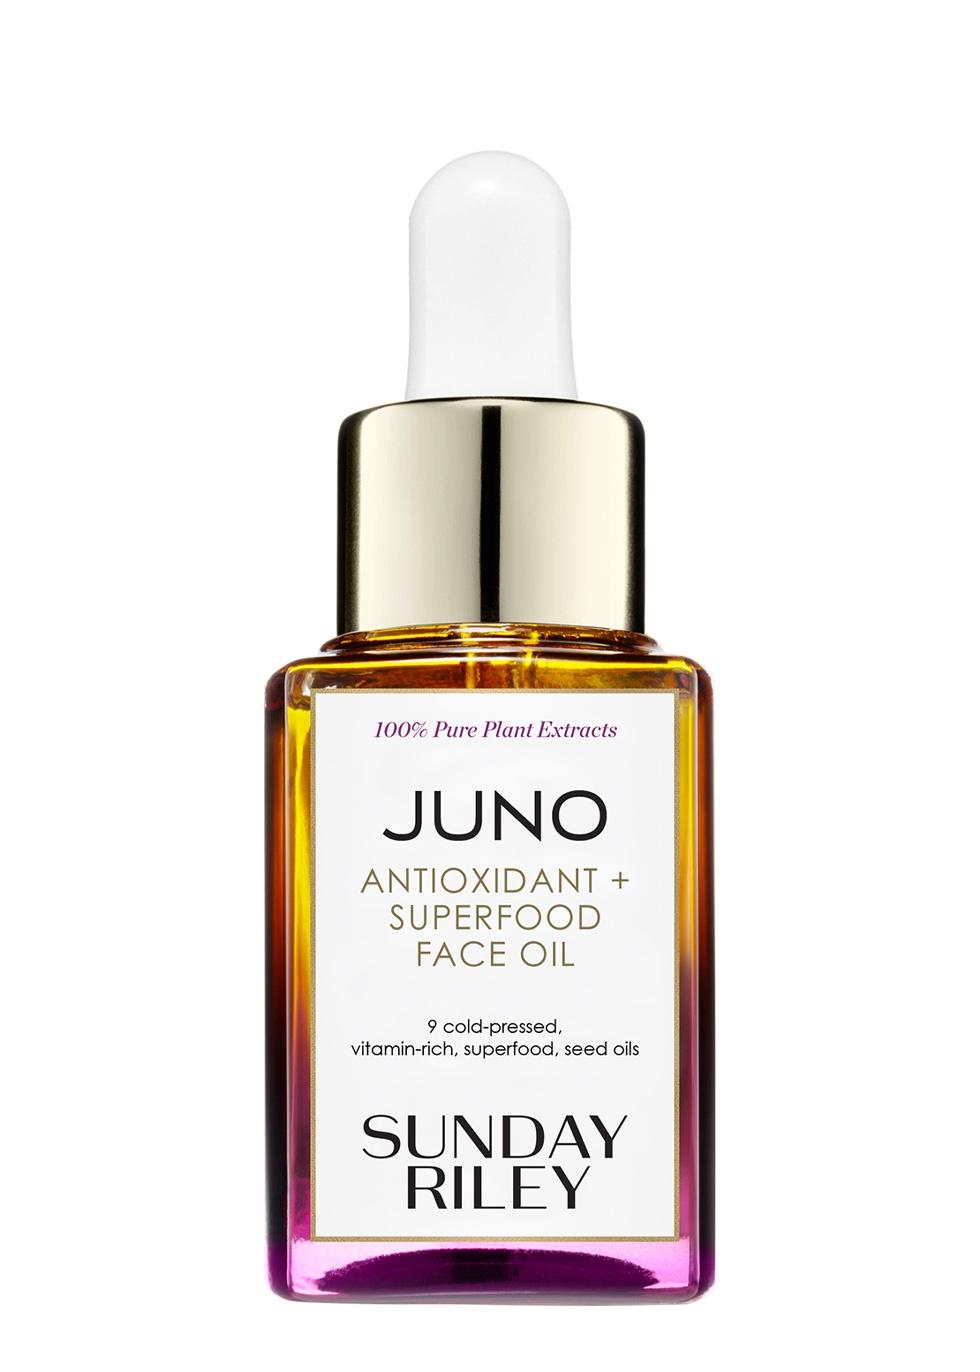 Juno Antioxidant + Superfood Face Oil 15ml